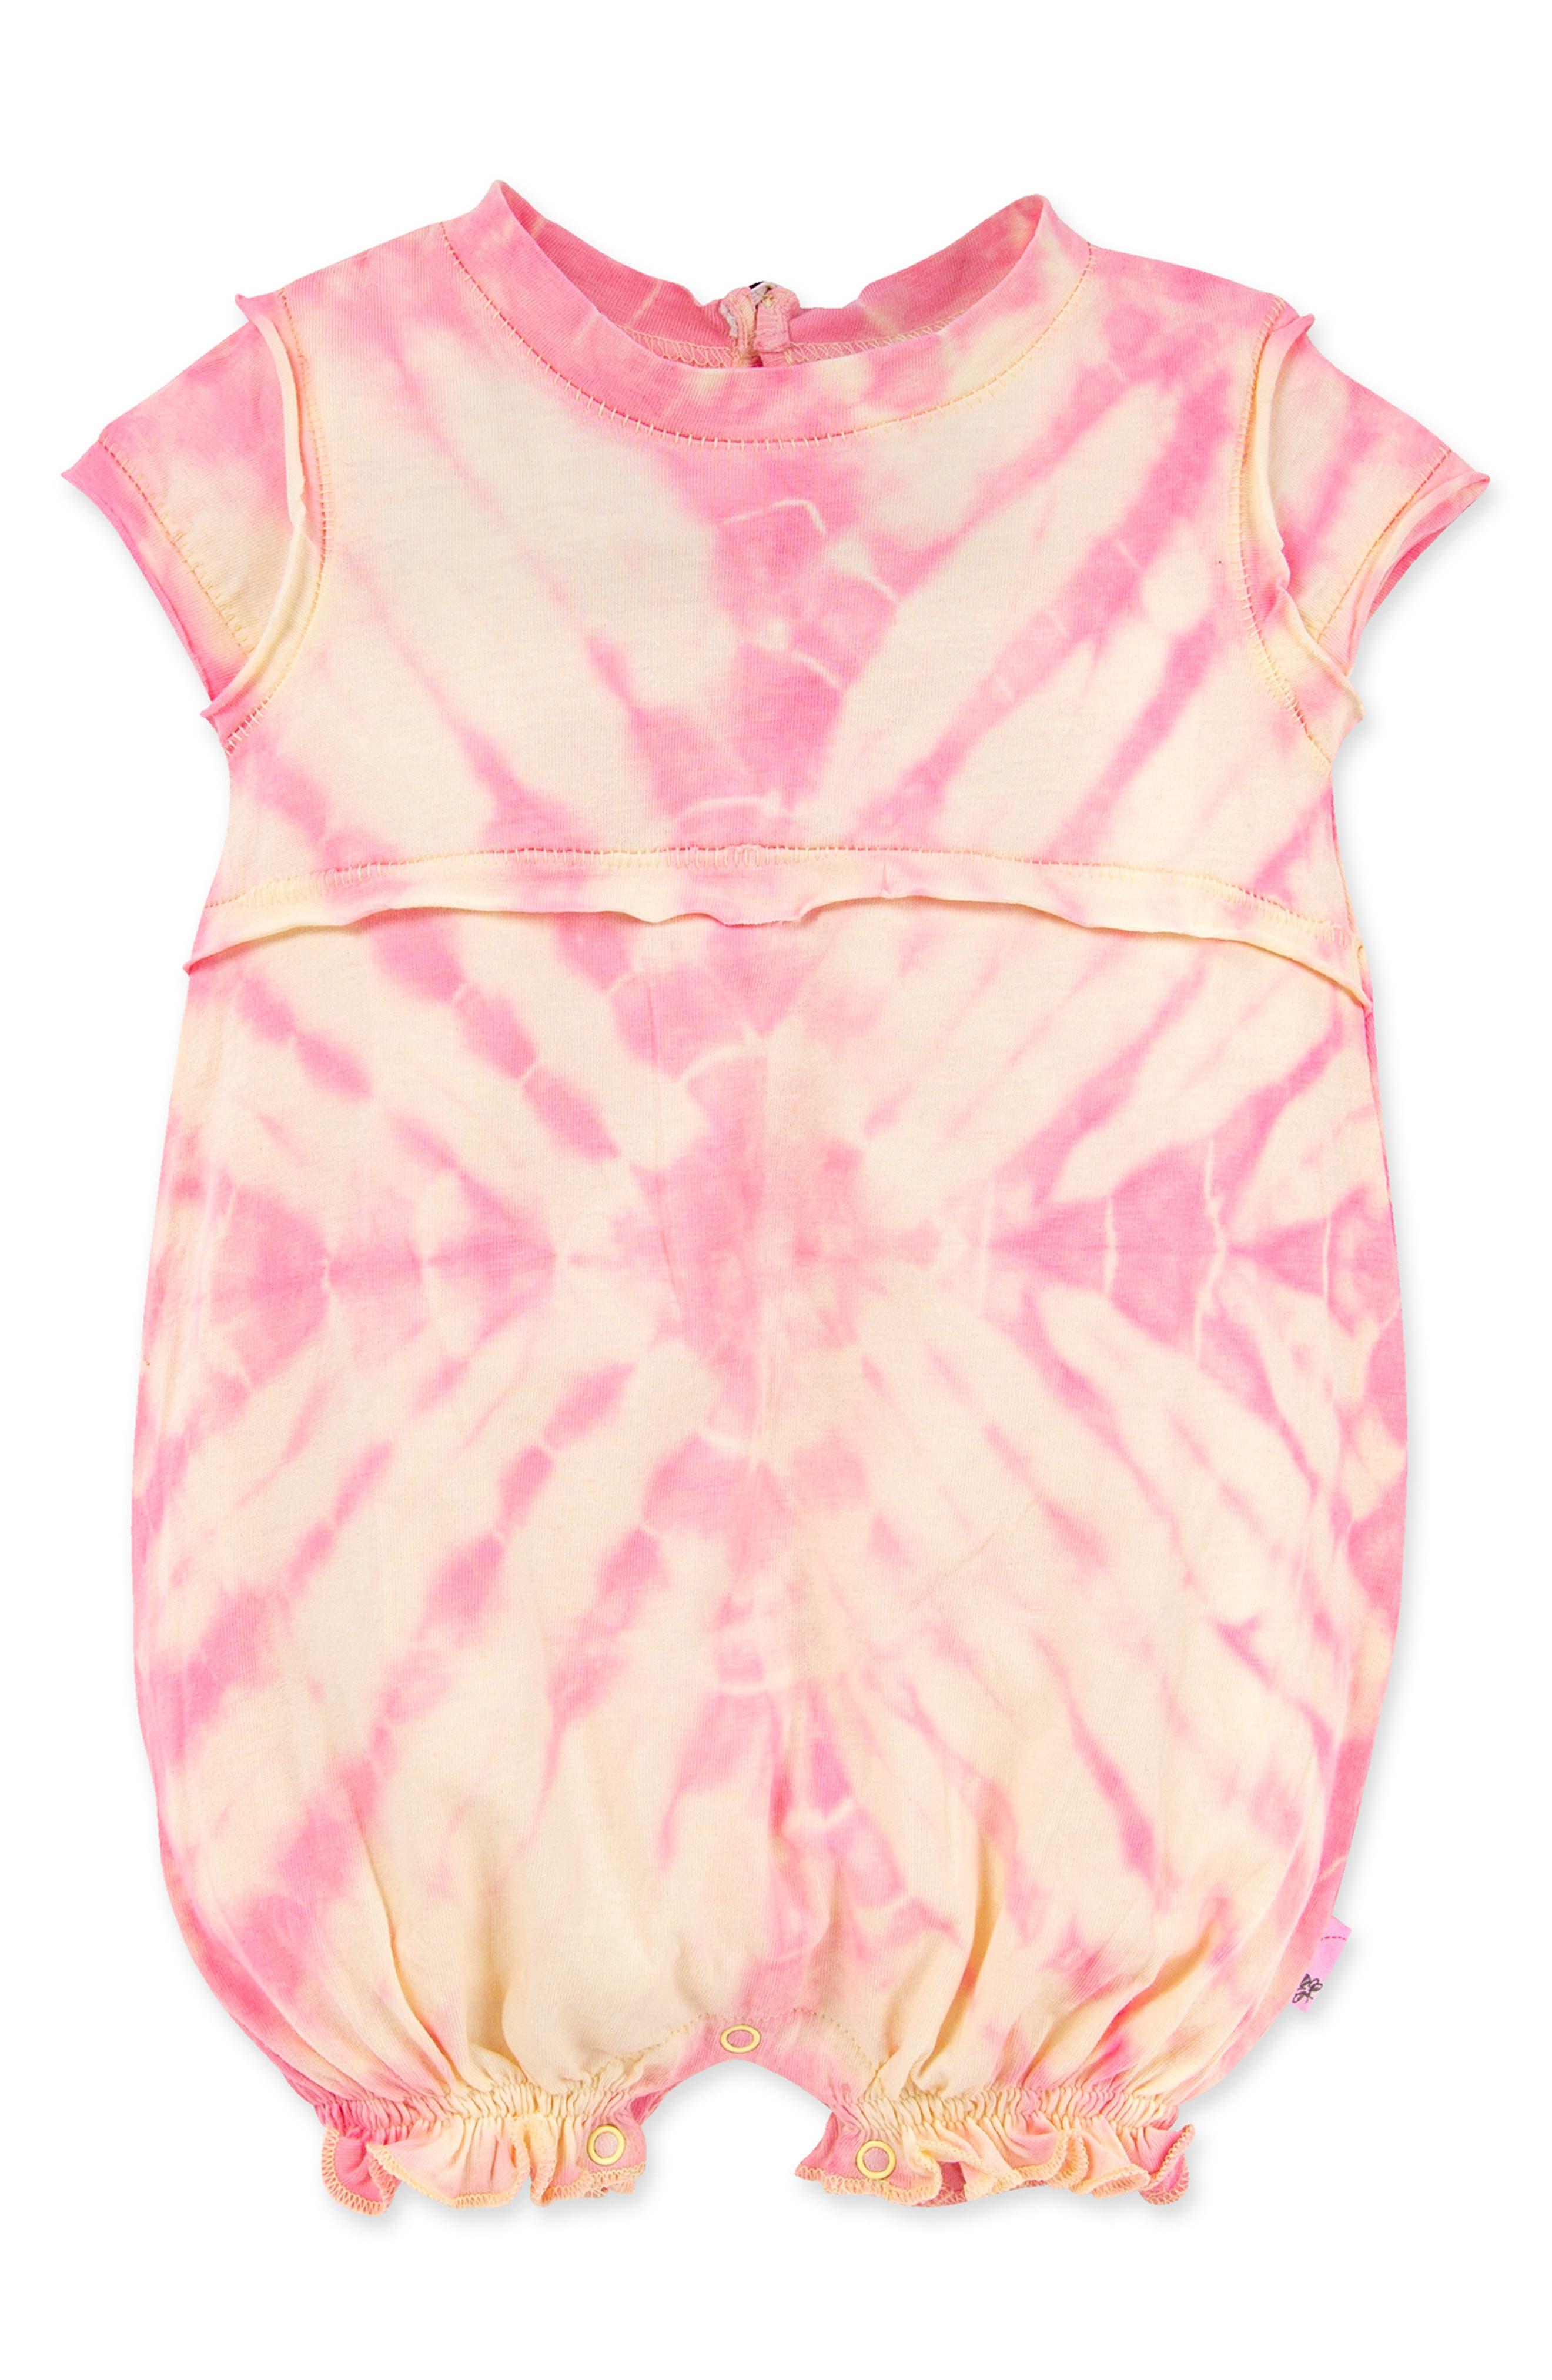 Kids Baby Girl Fleece Tops Sweatshirt Sweater Tutu Skirt Leggings Dress Outfits